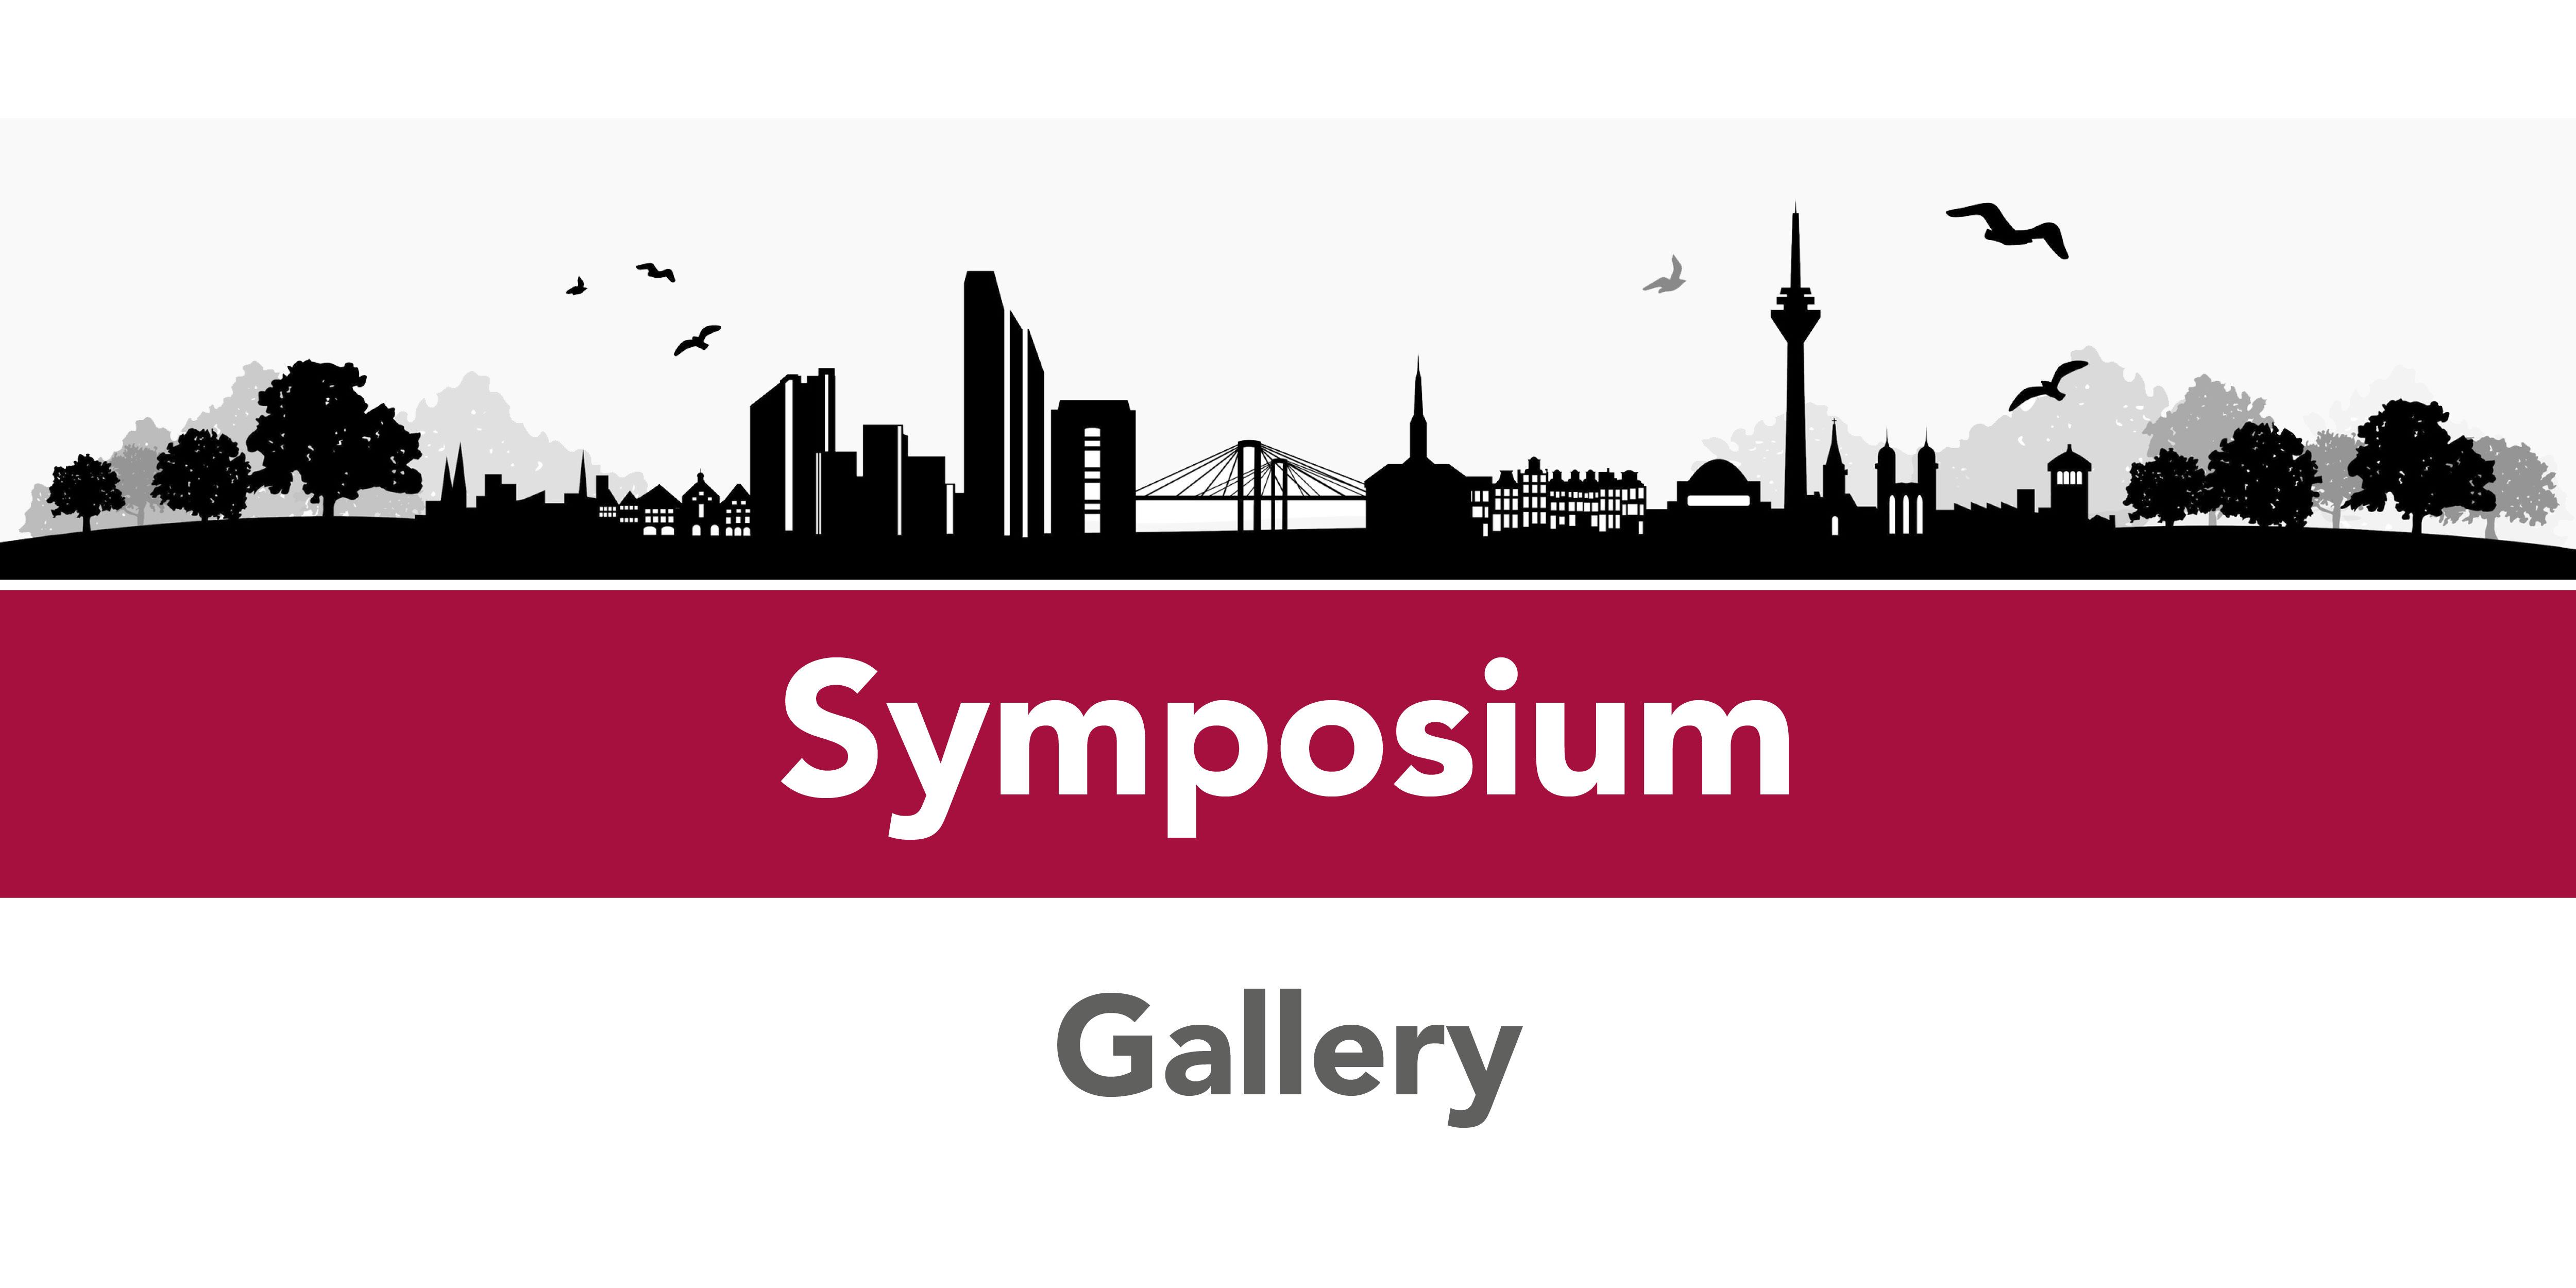 Stiftung_Molekulare_Medizin_Gallery